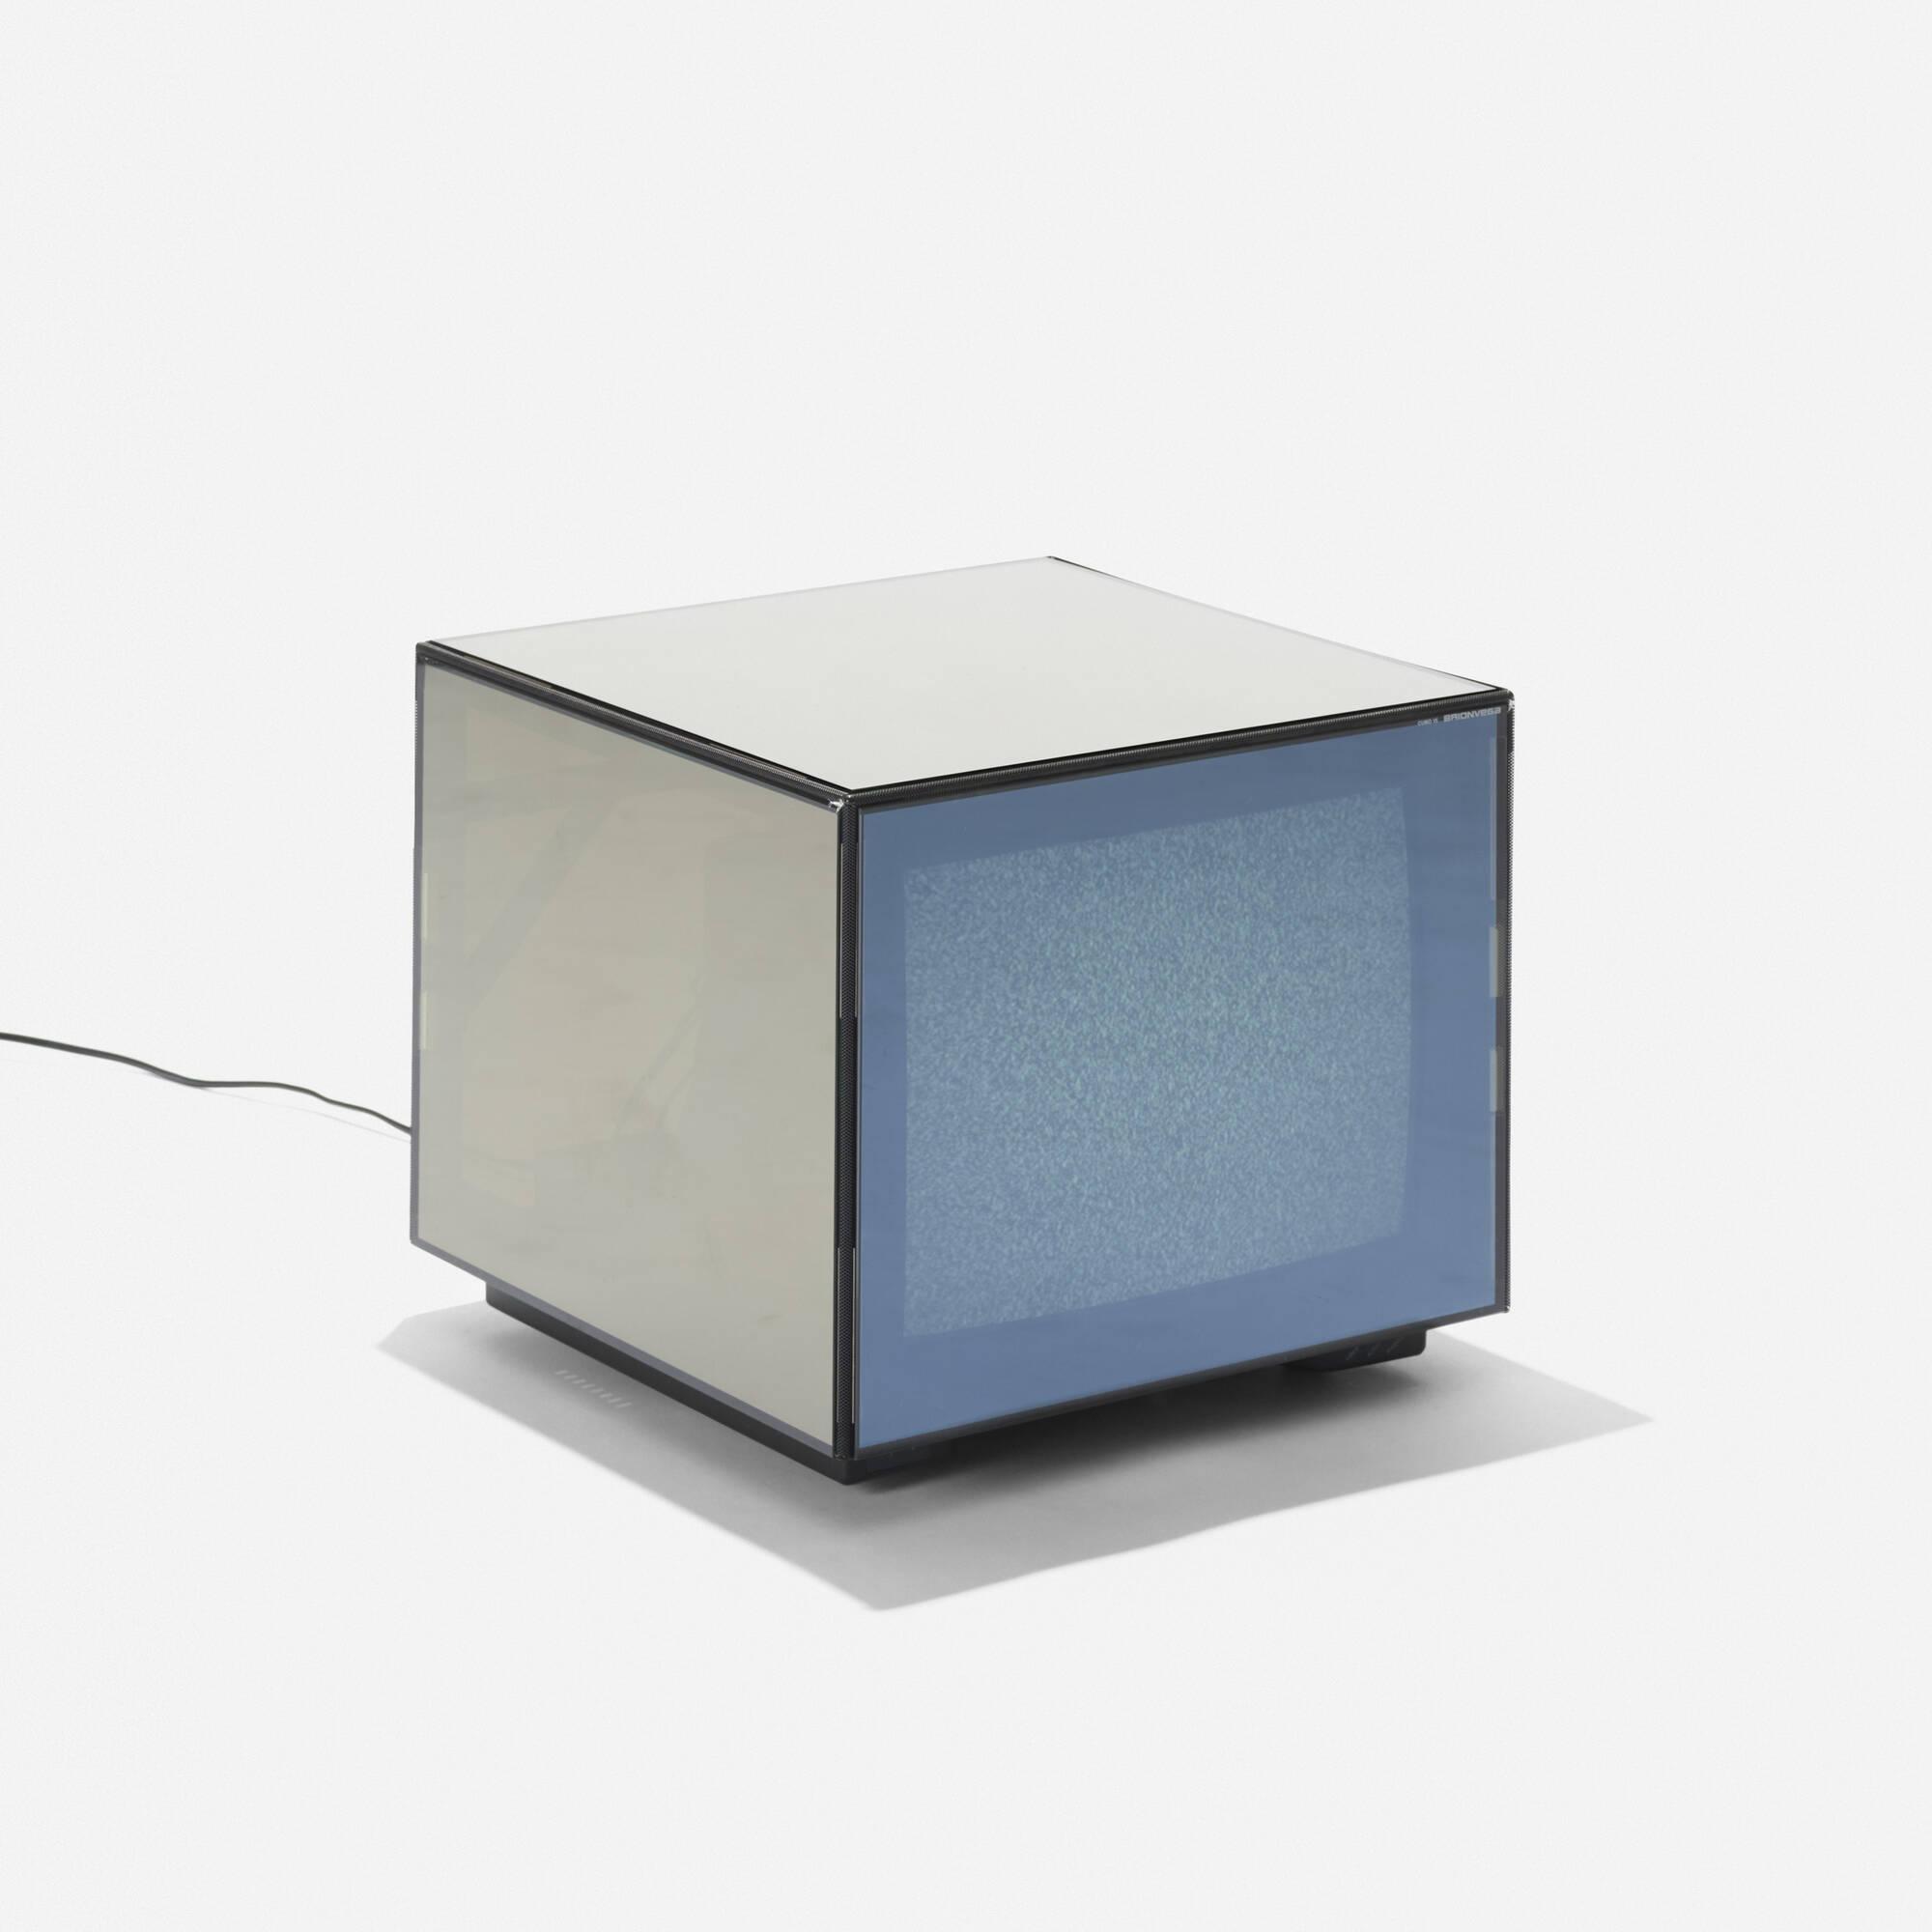 167: Mario Bellini / Cubo 15 television (1 of 2)